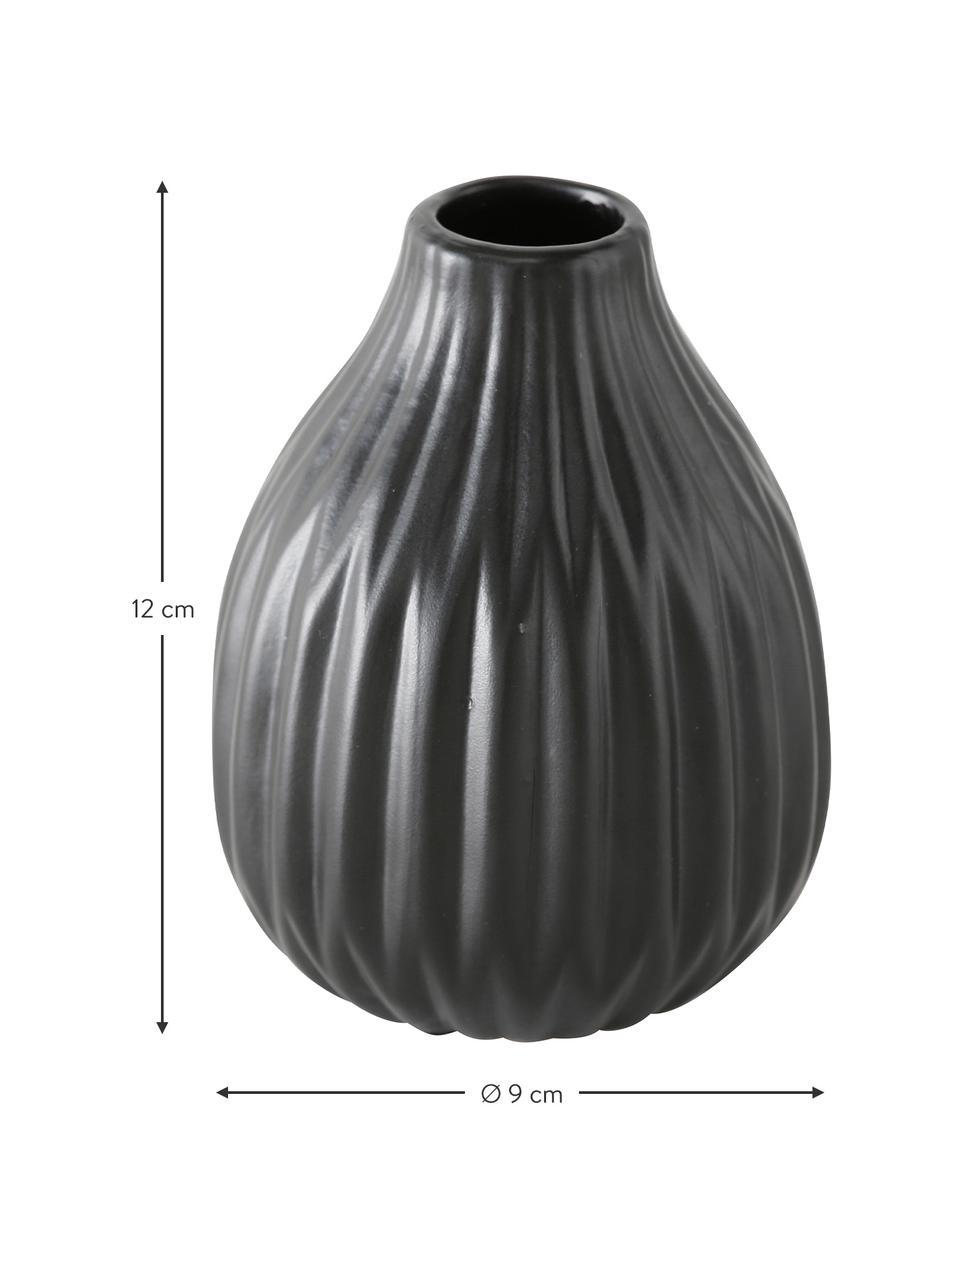 Set 3 vasi in porcellana Esko, Porcellana, Nero, Set in varie misure